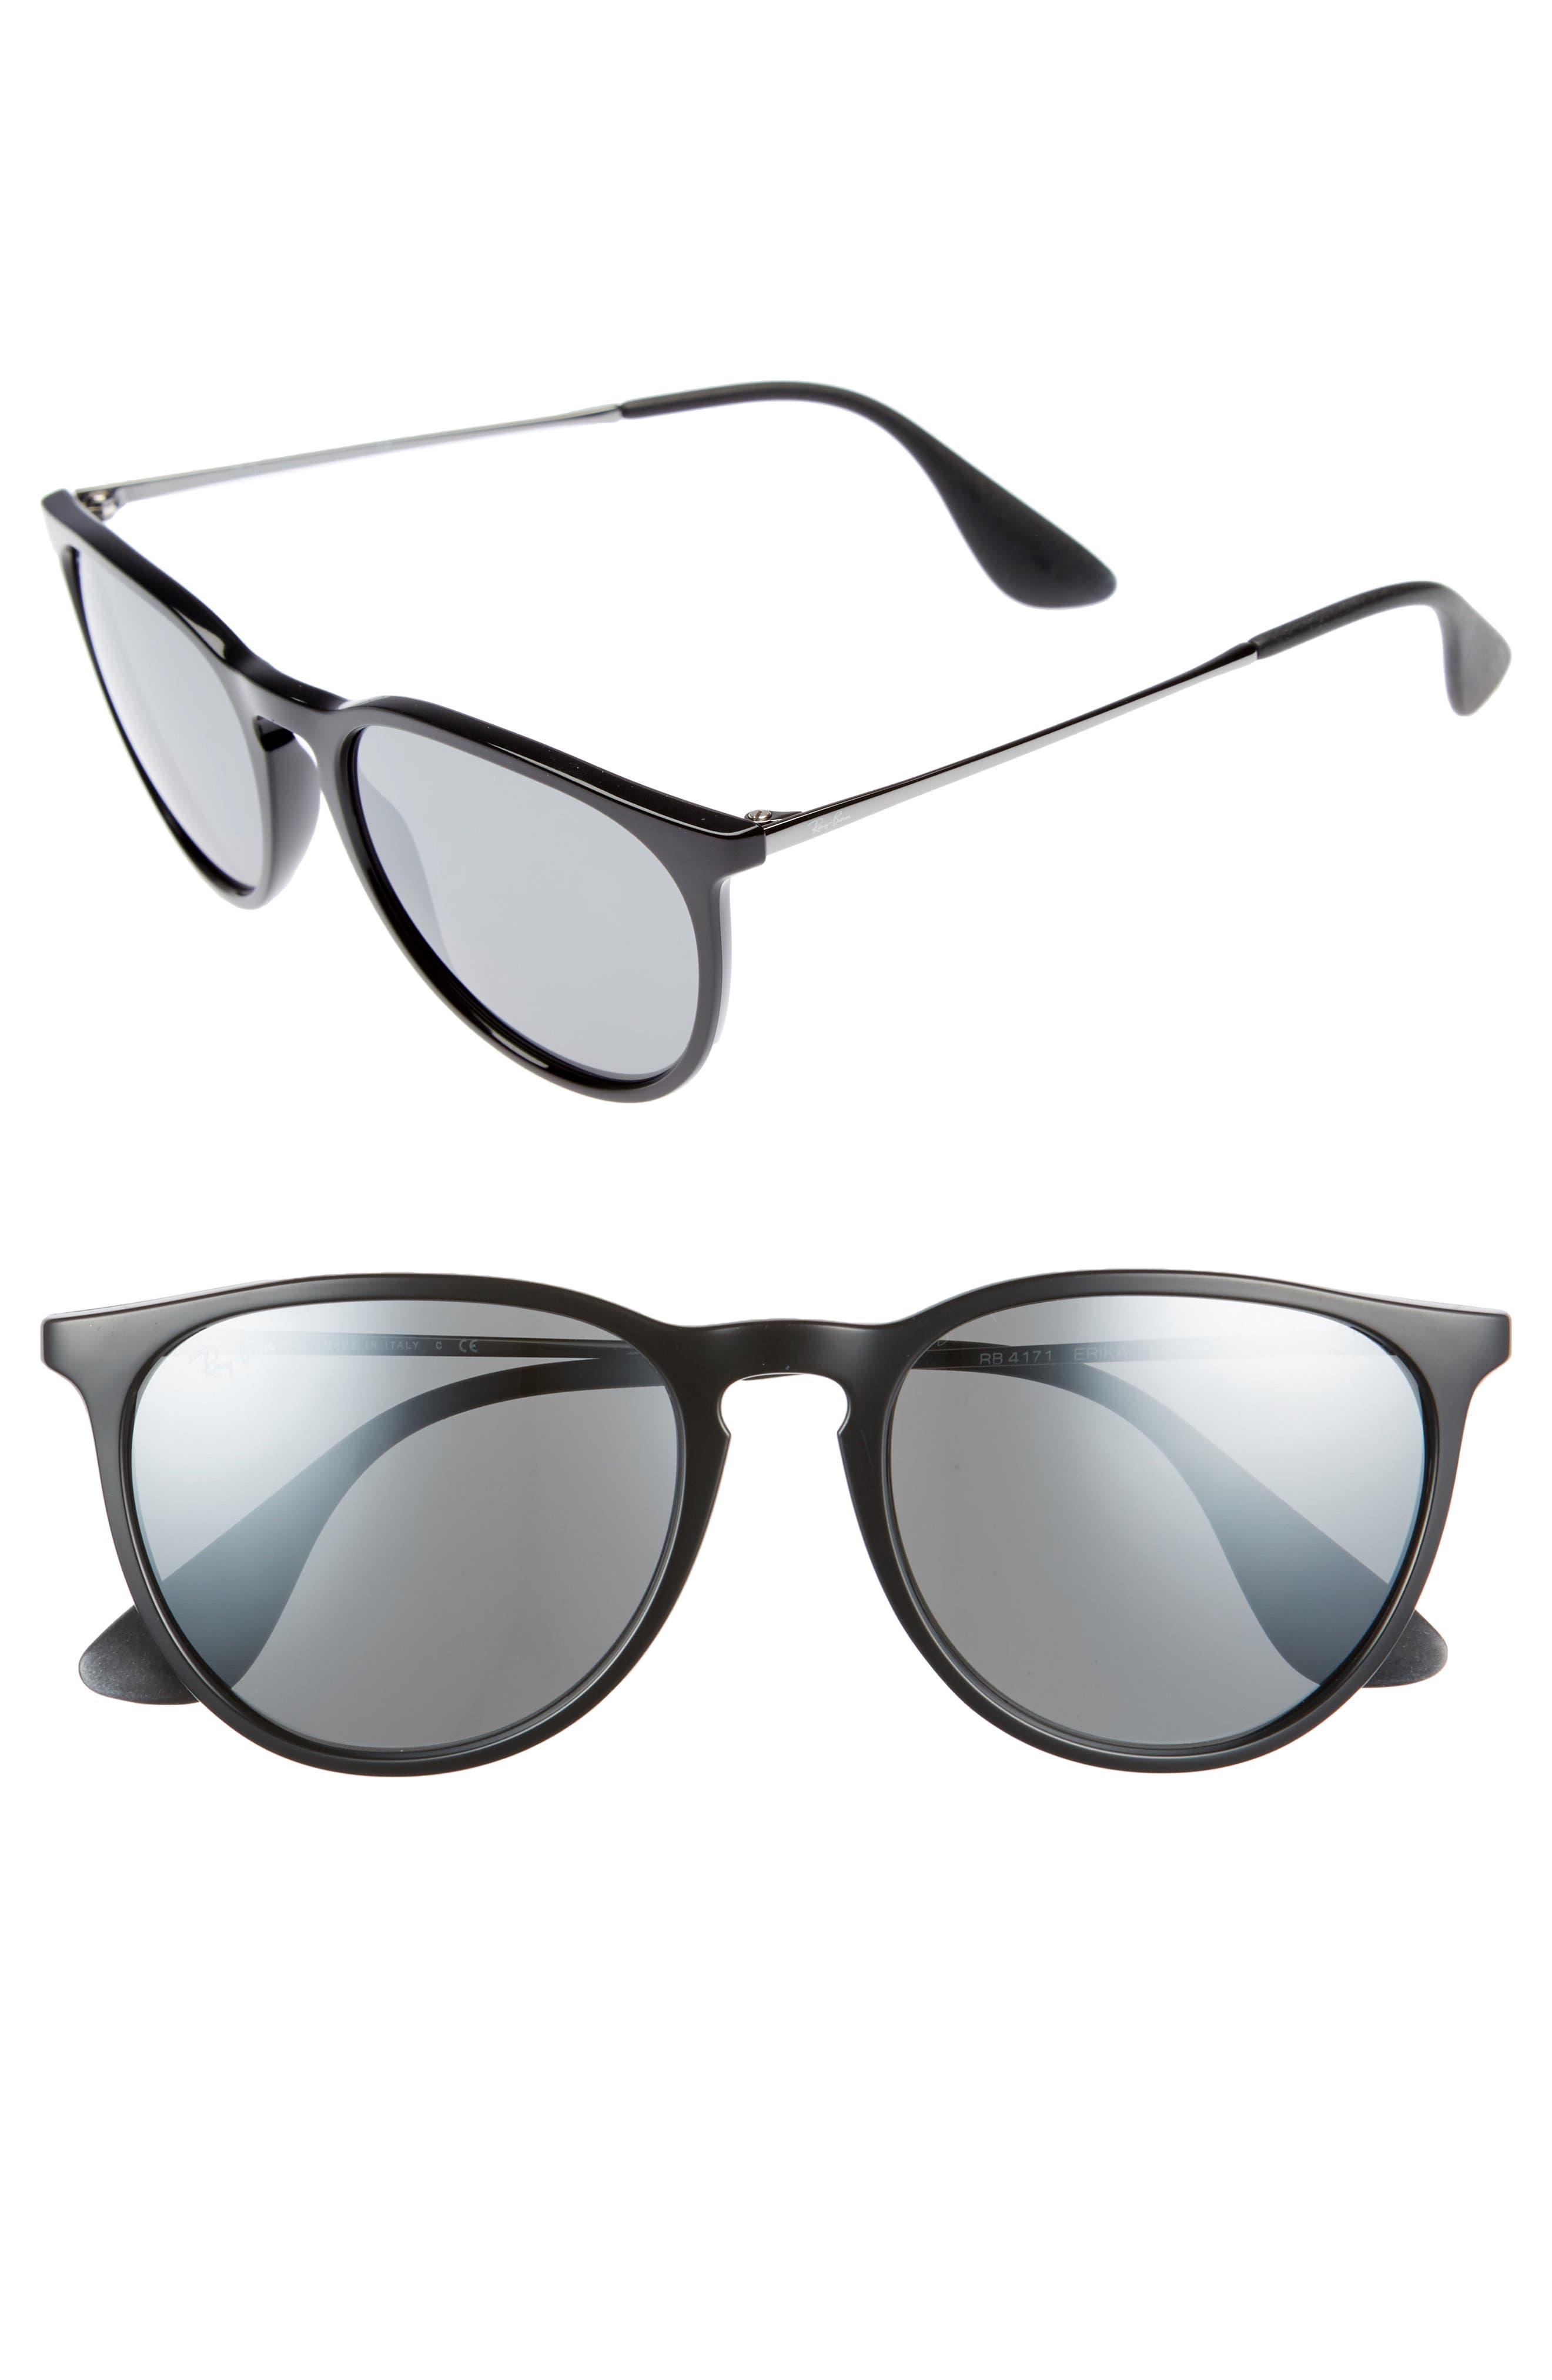 Erika 54mm Mirrored Sunglasses,                             Main thumbnail 1, color,                             001